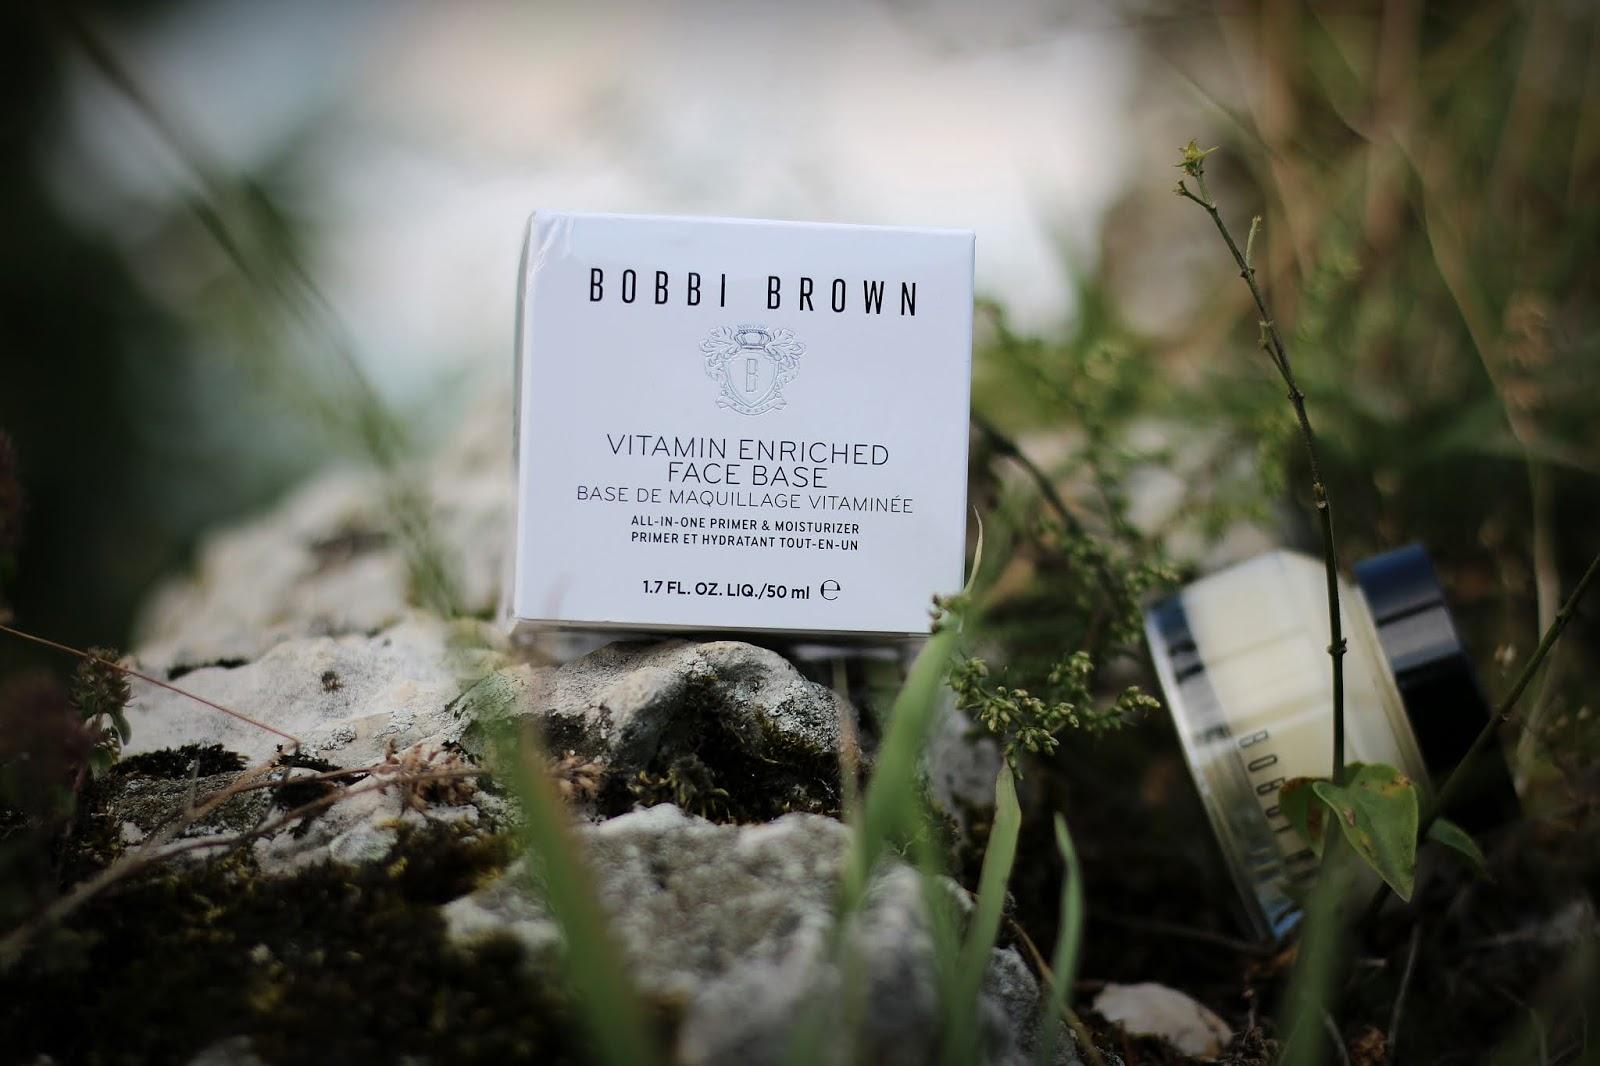 Bobbi Brown Vitamin Enriched